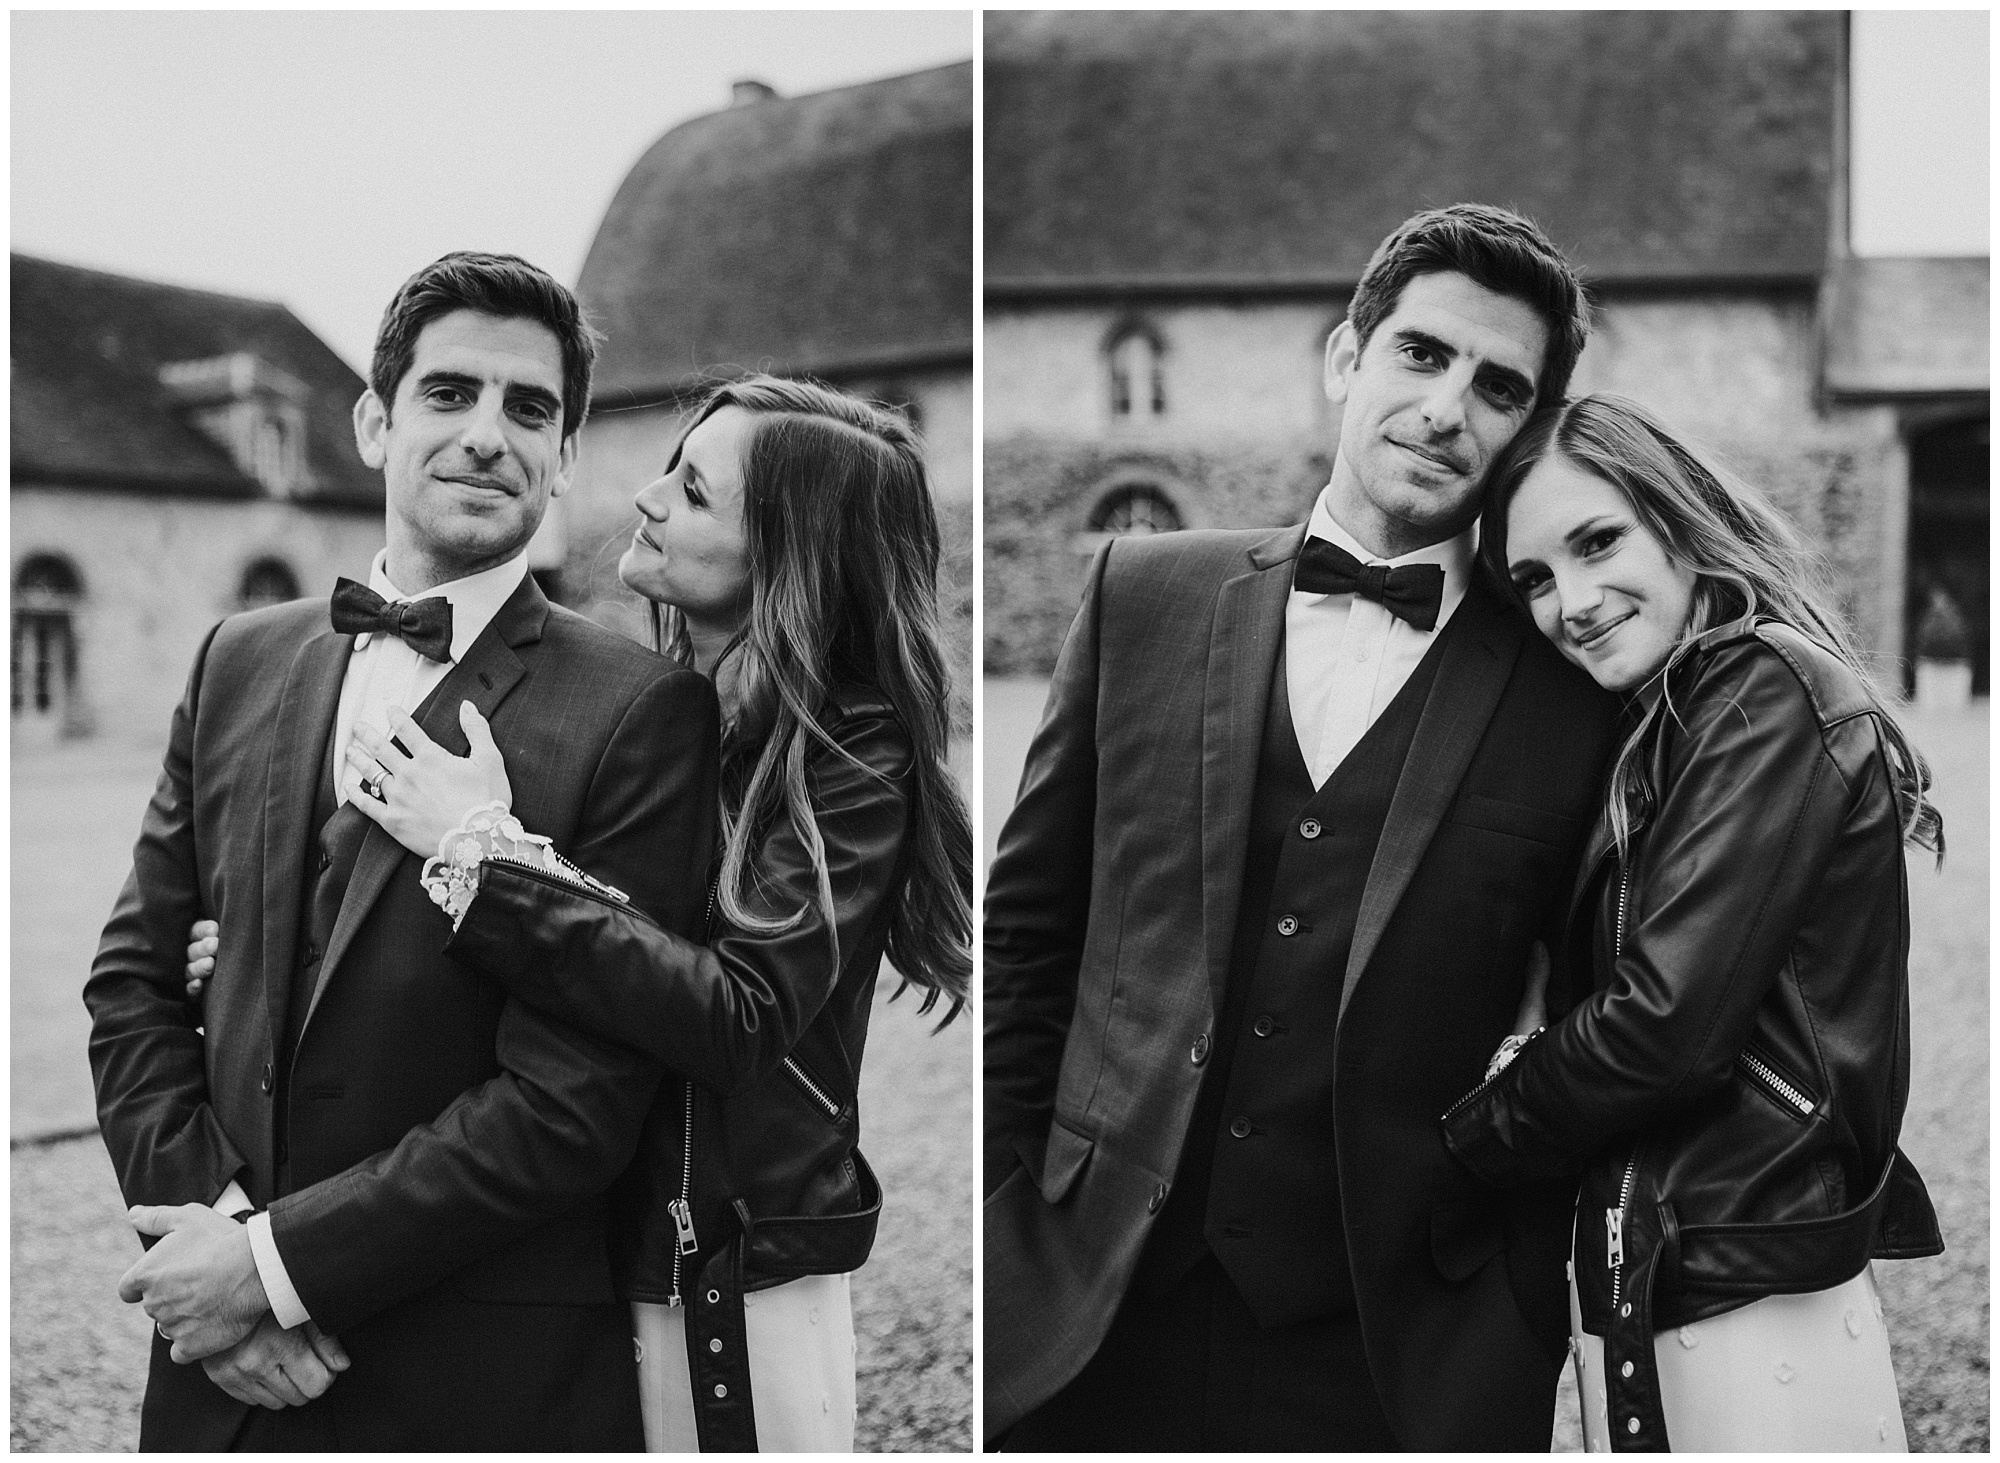 Kateryna-photos-photographer-reims-domaine-des-evis-mariage-normandie-rime-arodaky_0275.jpg